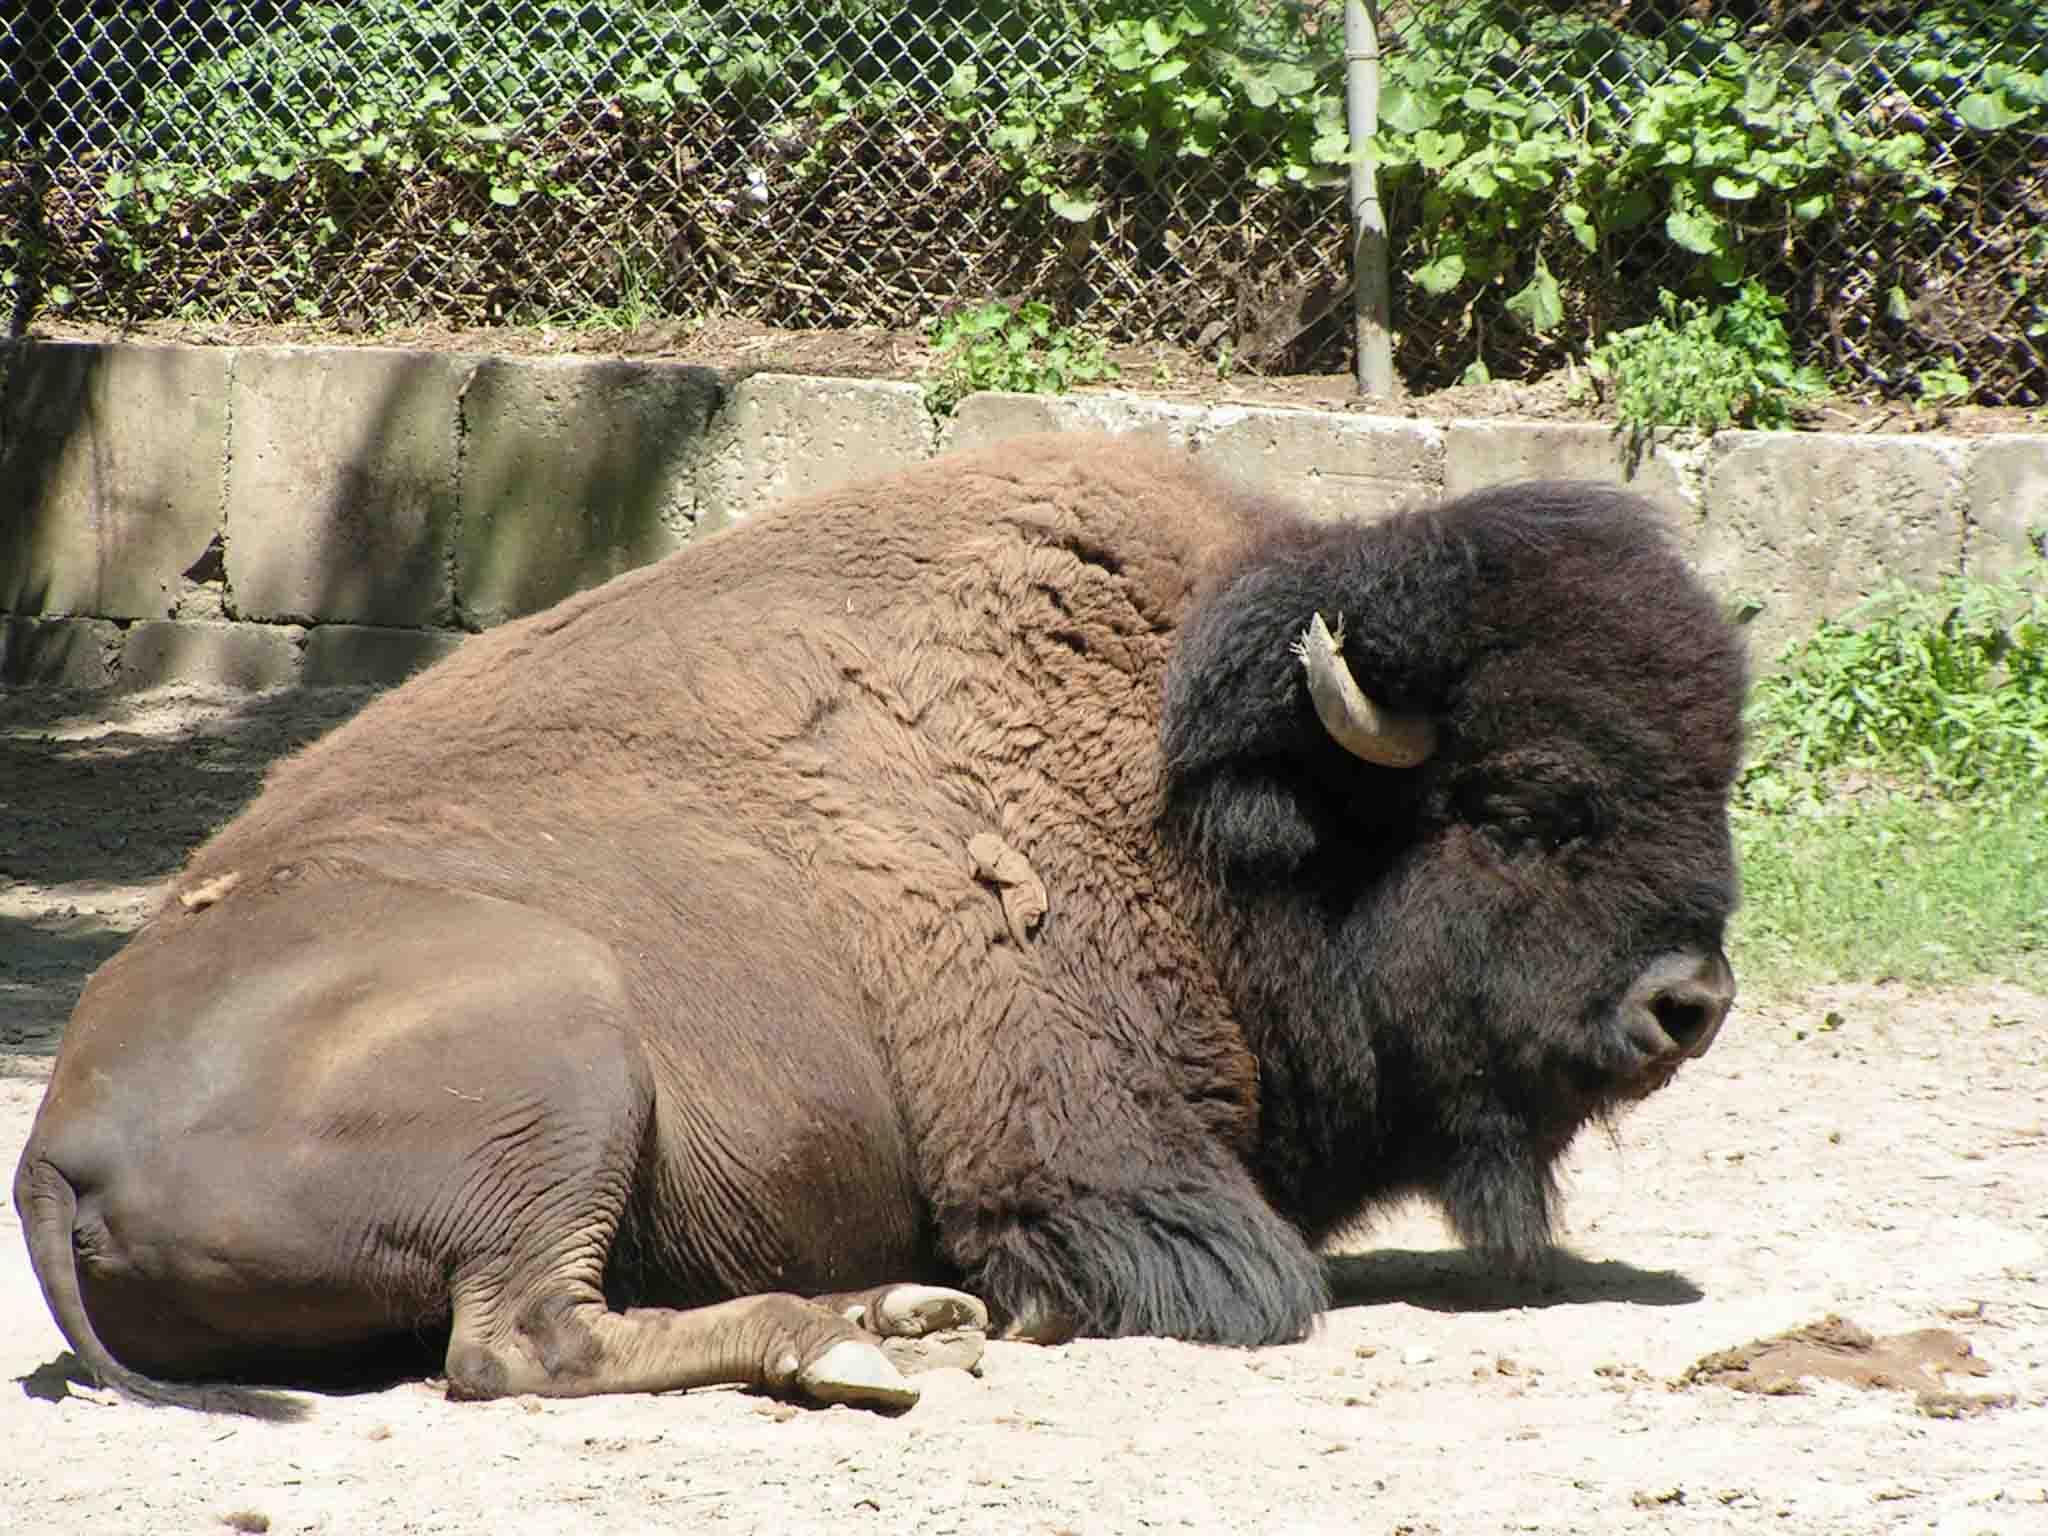 Joseph Bruchac - Buffalo in Syracuse Zoo: http://armedwithvisions.com/2012/01/22/joseph-bruchac-buffalo-in-syracuse-zoo/